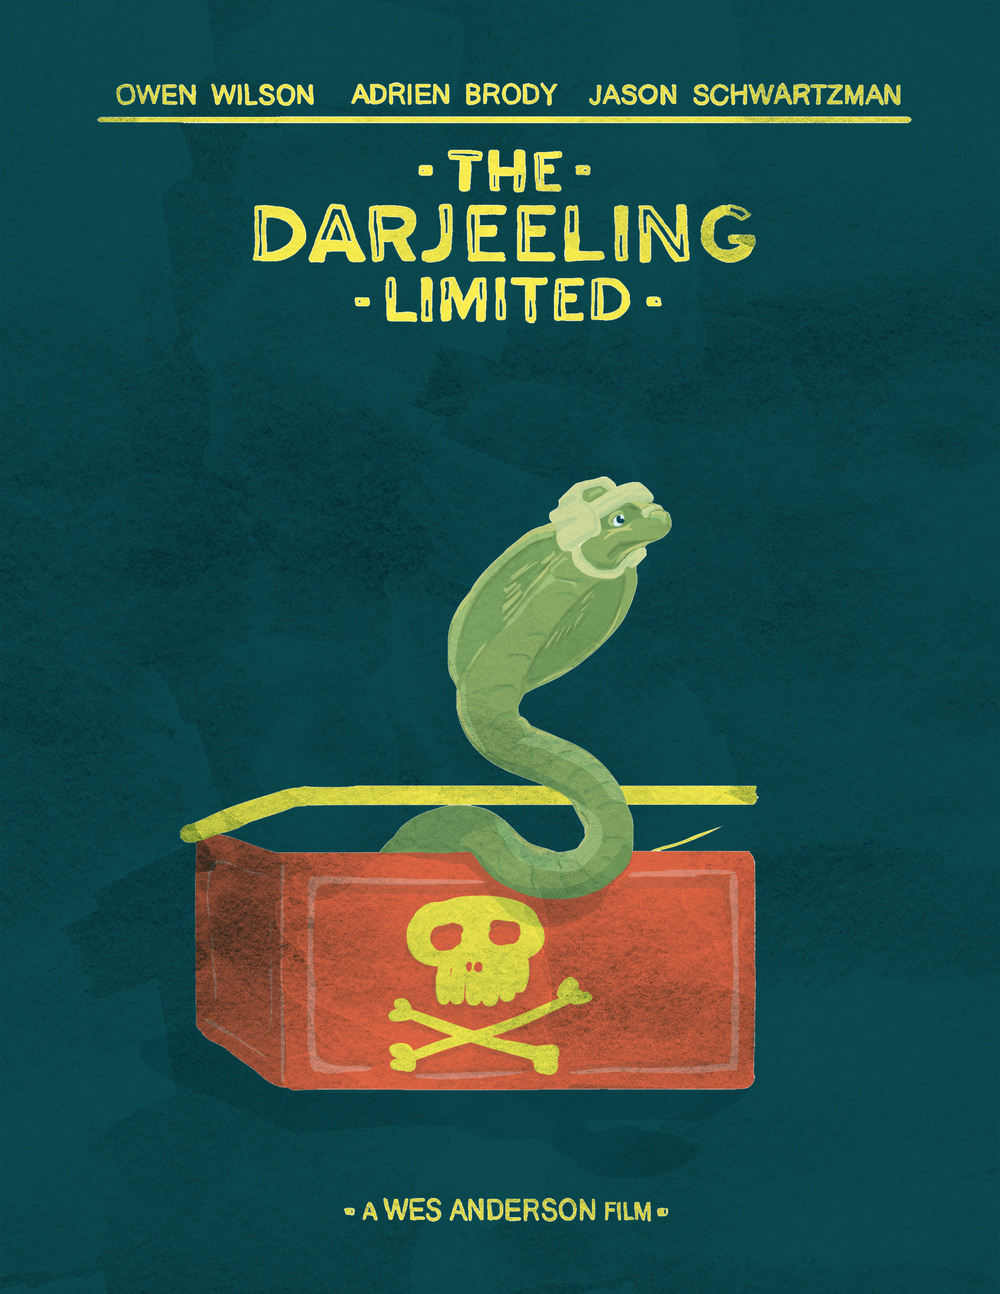 darjeeling_11x8.5.jpg